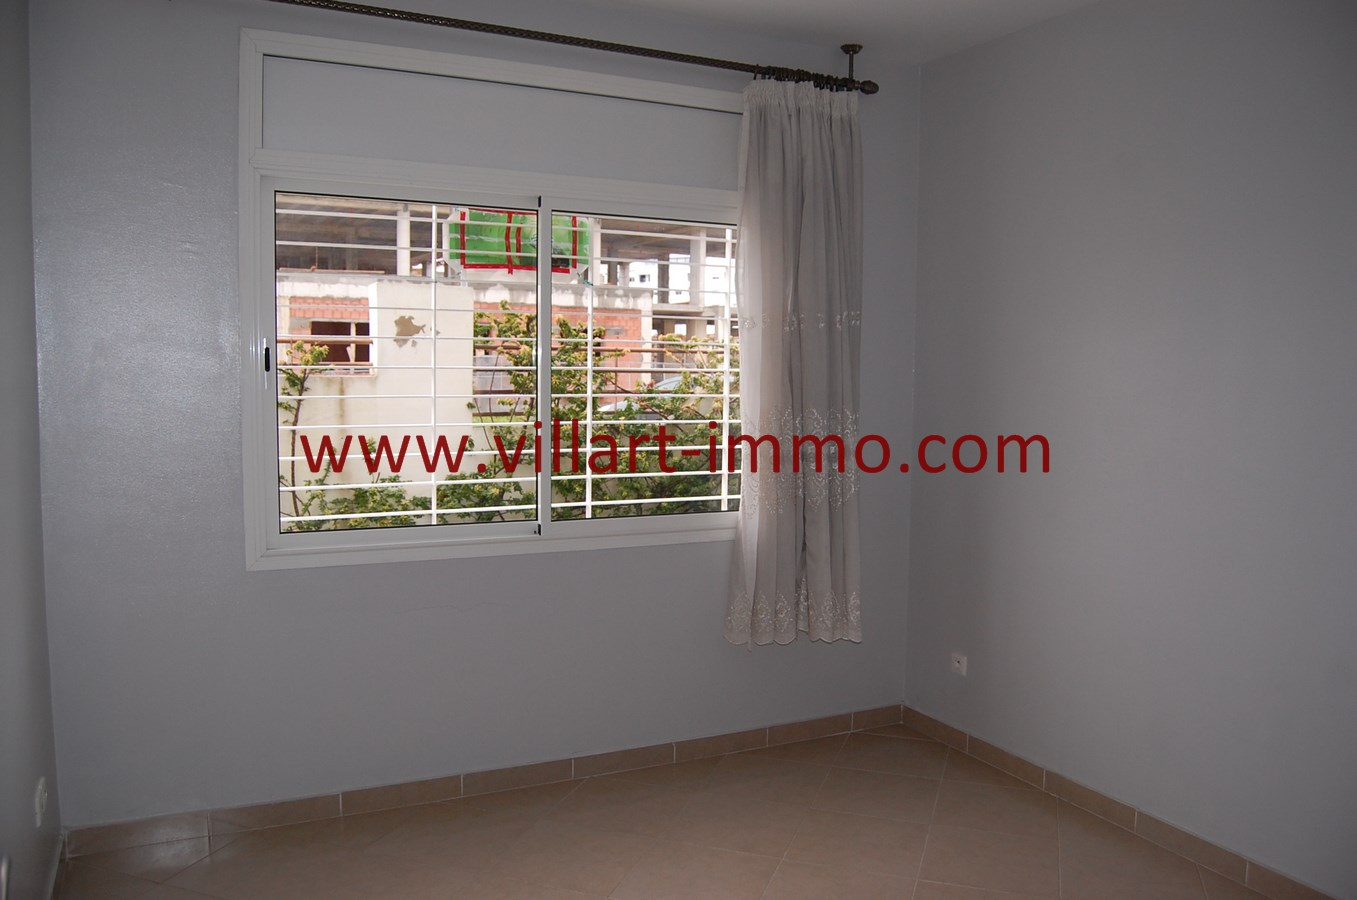 3-Vente-Appartement-Tanger-Route-de-Rabat-Chambre 2-VA474-Villart Immo